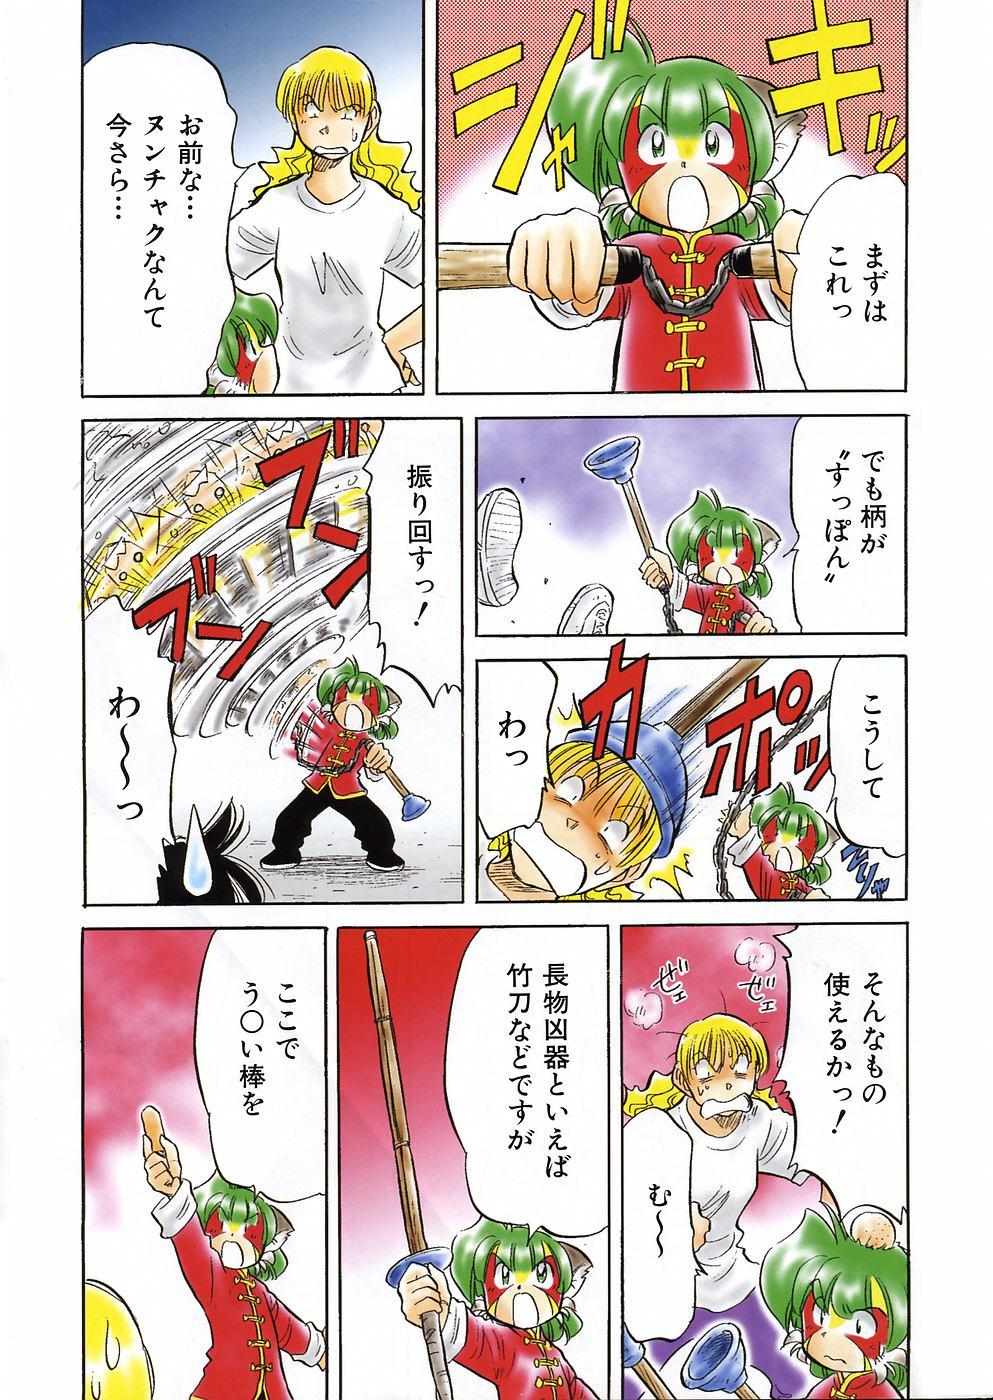 COMIC AUN 2005-12 Vol. 115 409